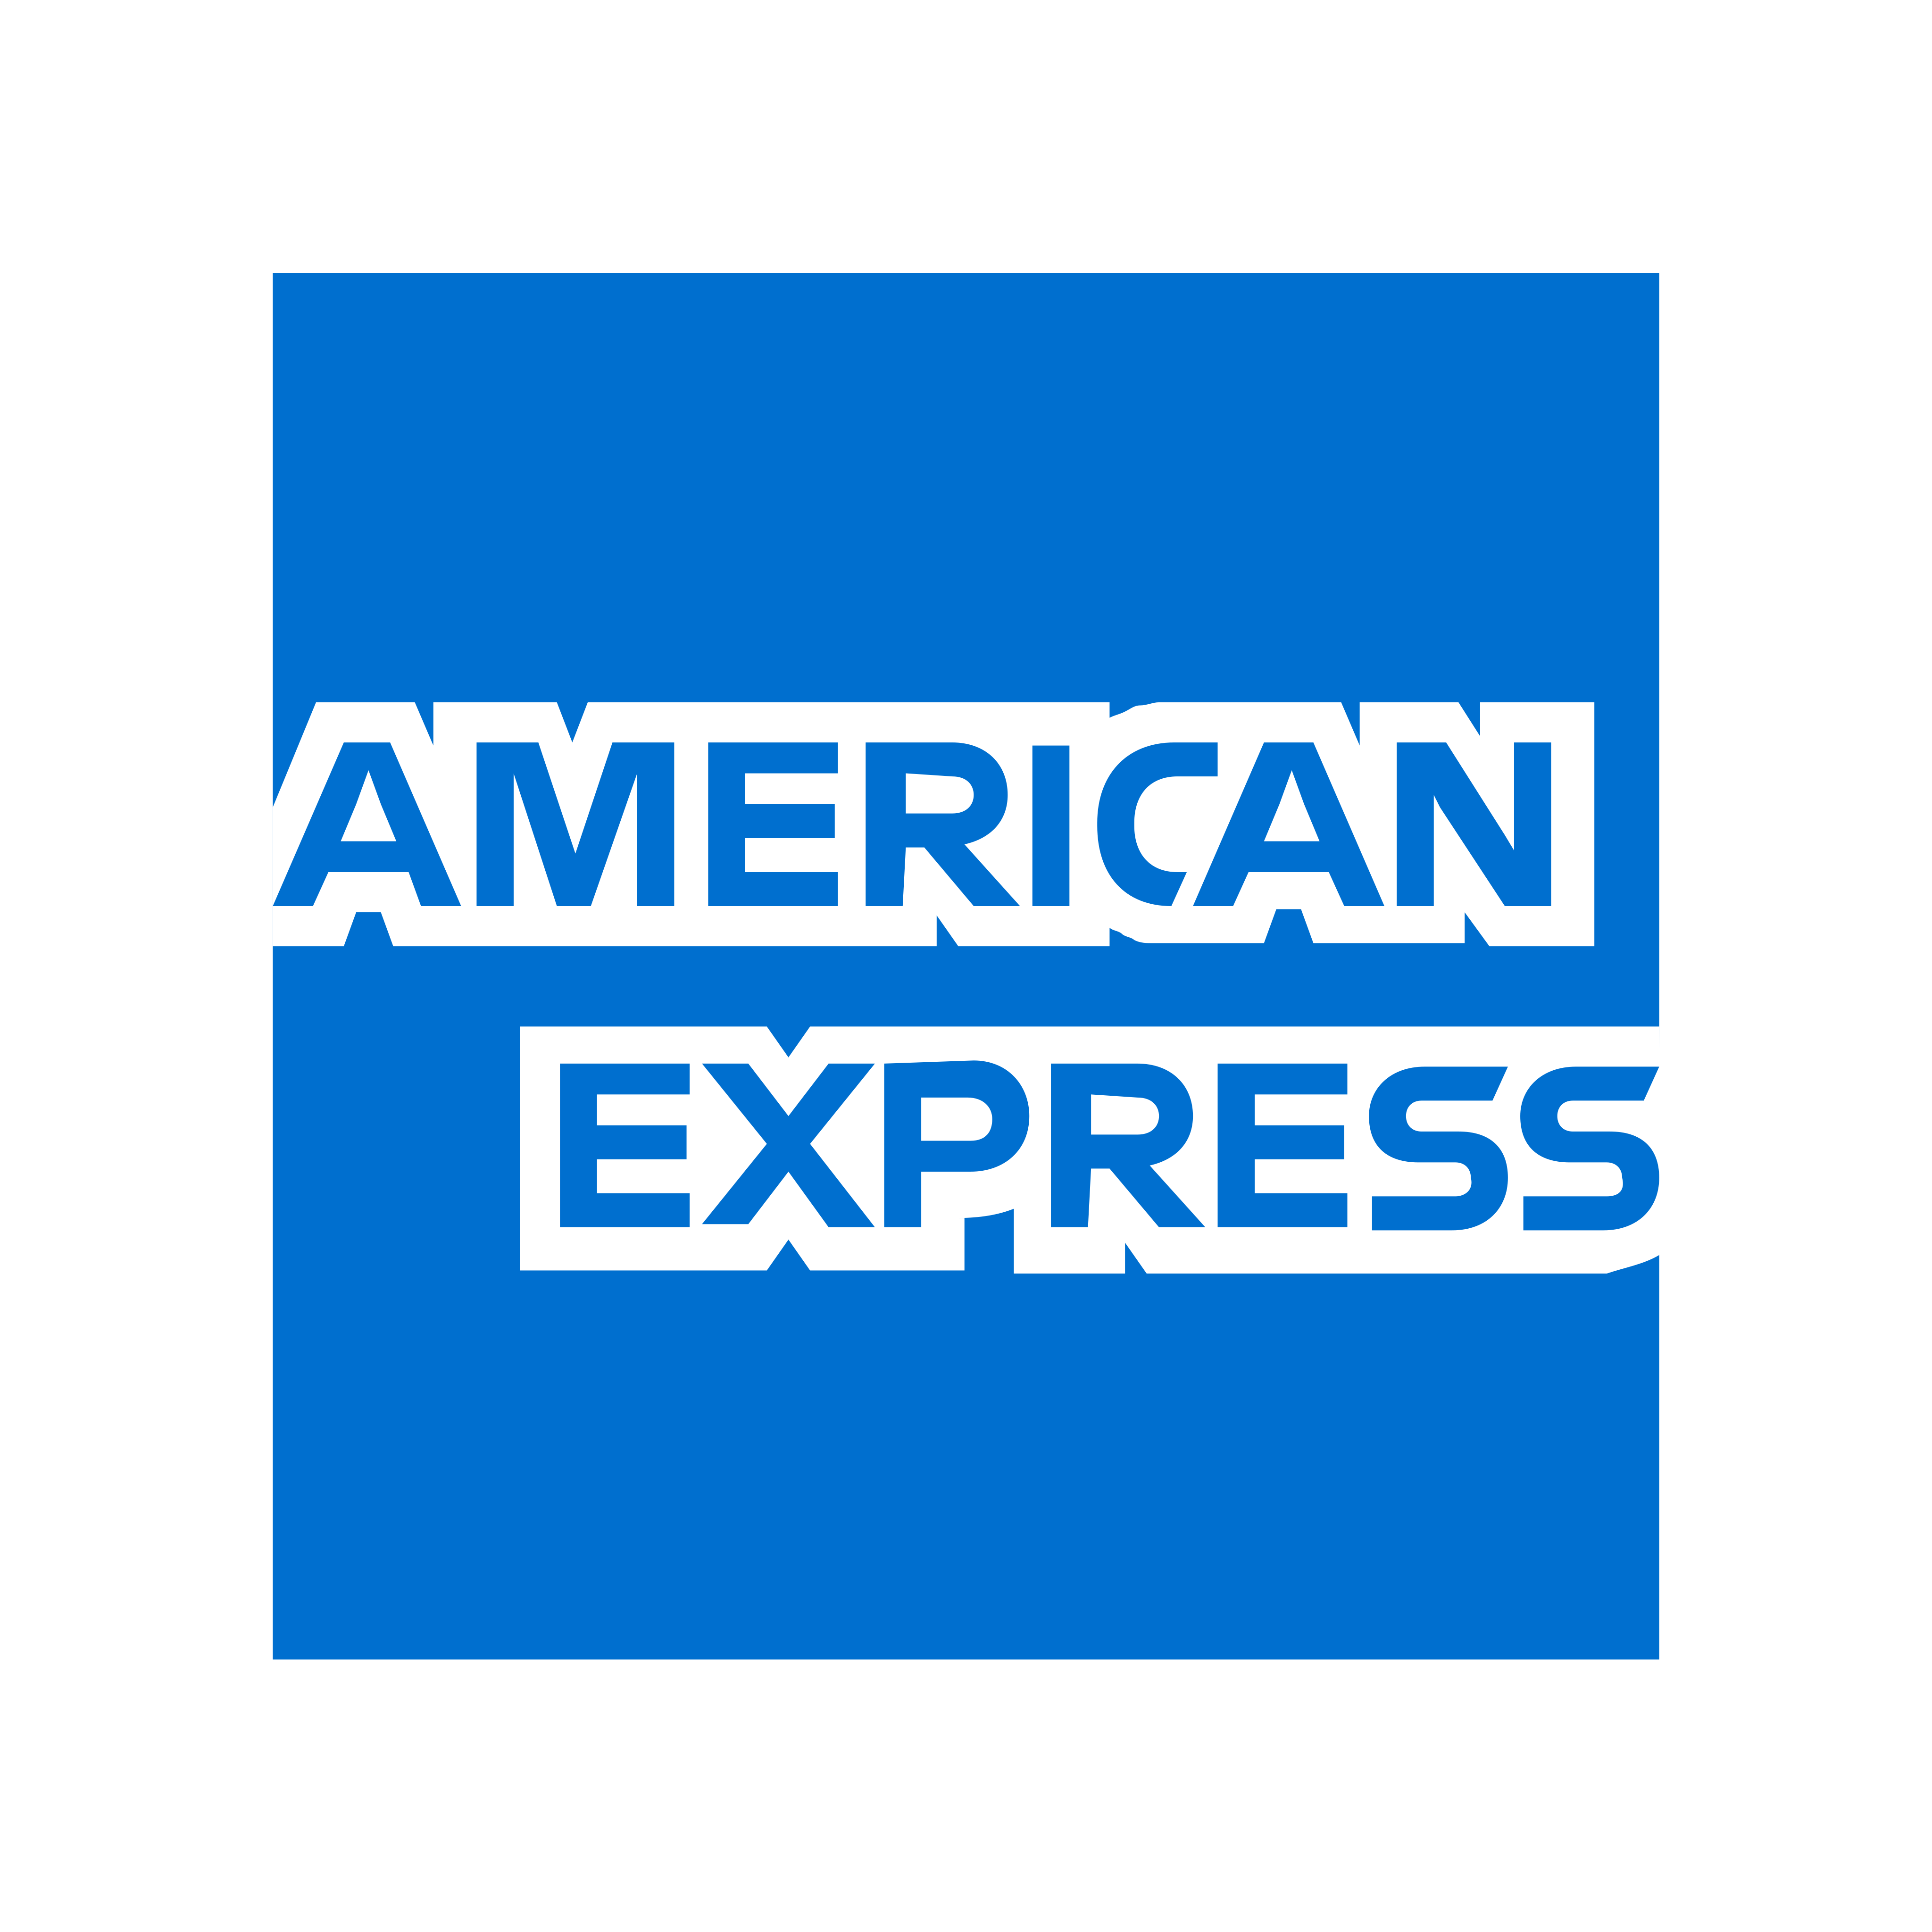 amex american express logo 0 - American Express Logo